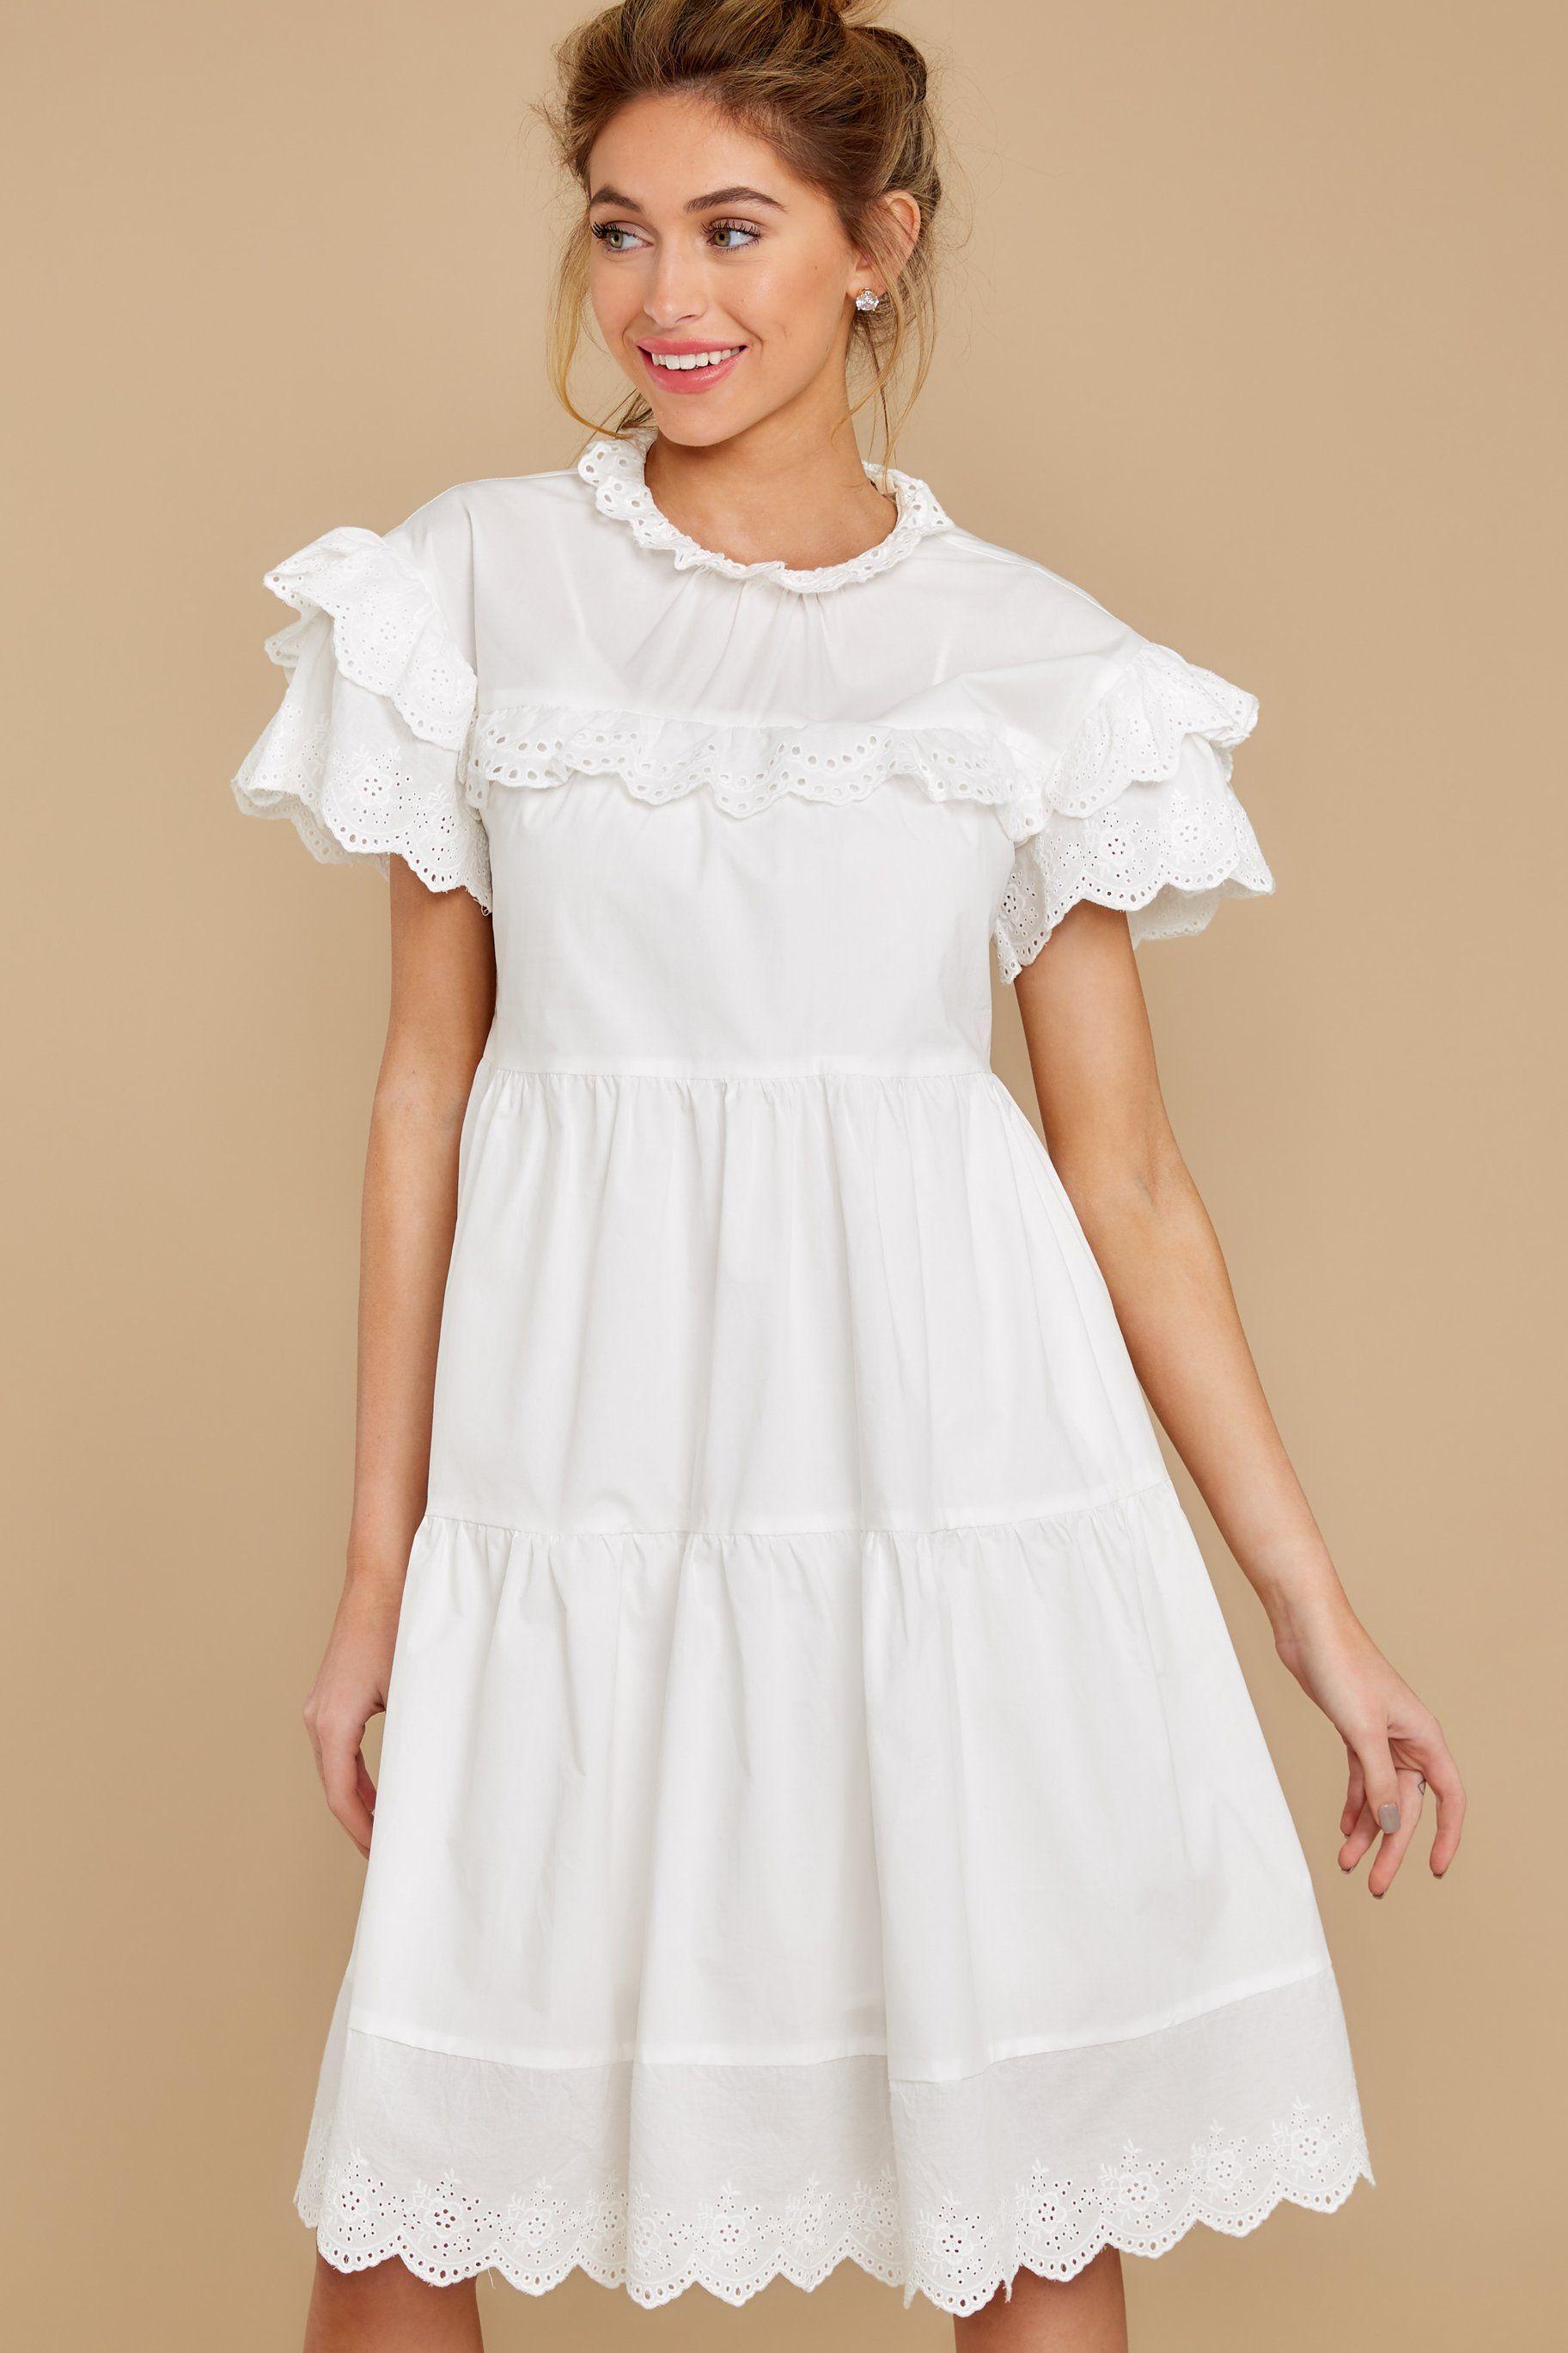 Adorable White Eyelet Dress Short Sleeve Dress Lace Dress 54 Red Dress Dresses Red Dress Eyelet Lace Dress [ 2738 x 1825 Pixel ]